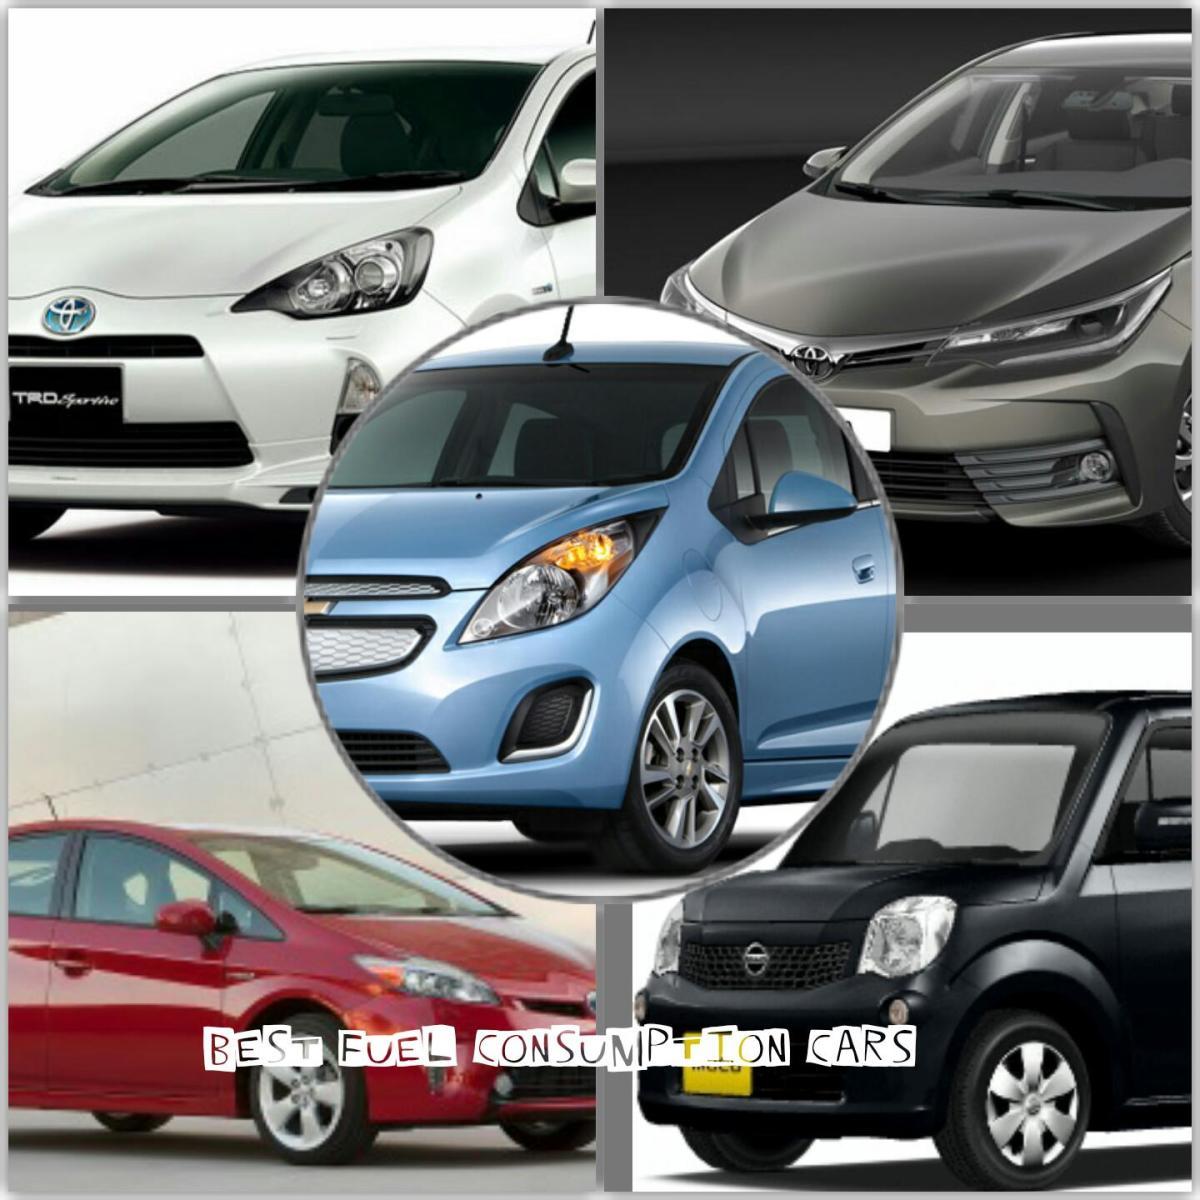 top 10 fuel efficient cars used in pakistan smart earning methods. Black Bedroom Furniture Sets. Home Design Ideas